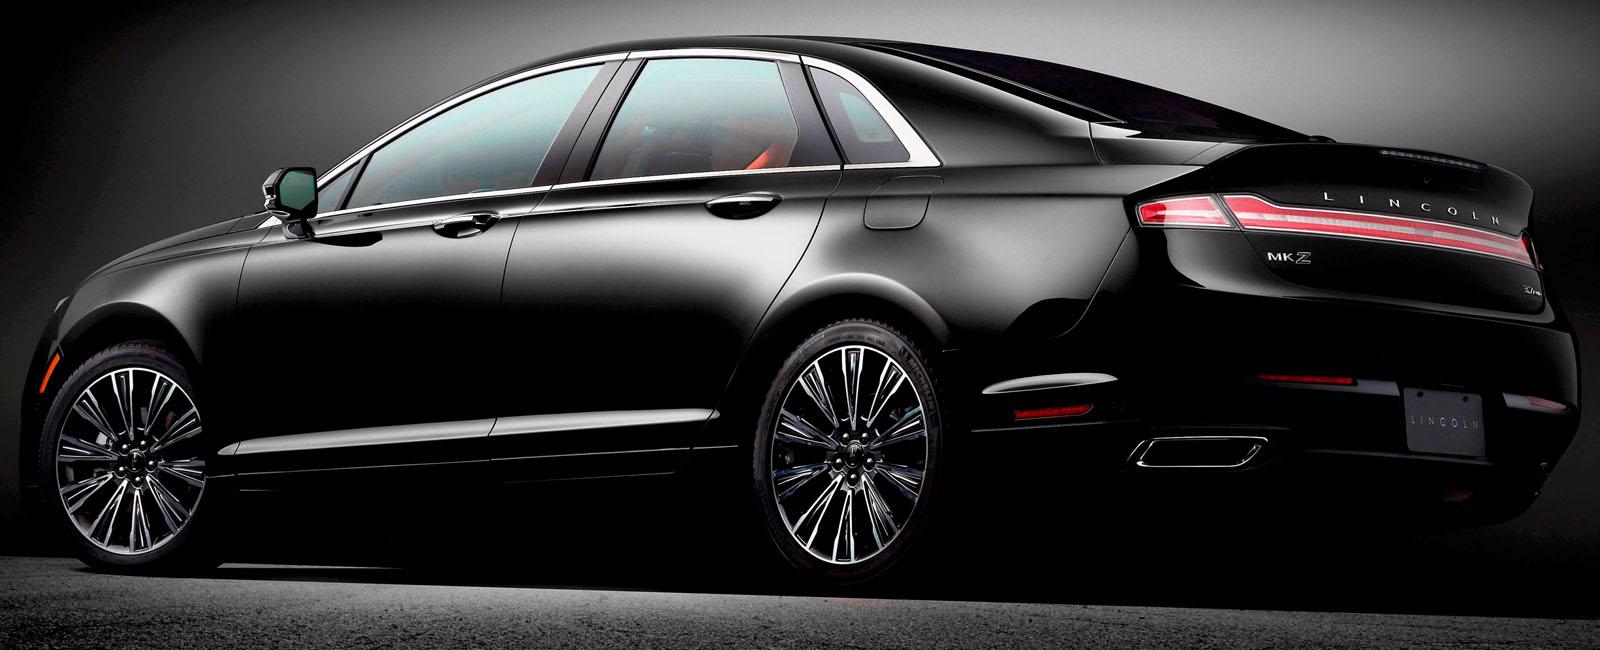 sedans-inc-austin-mkz-hybrid